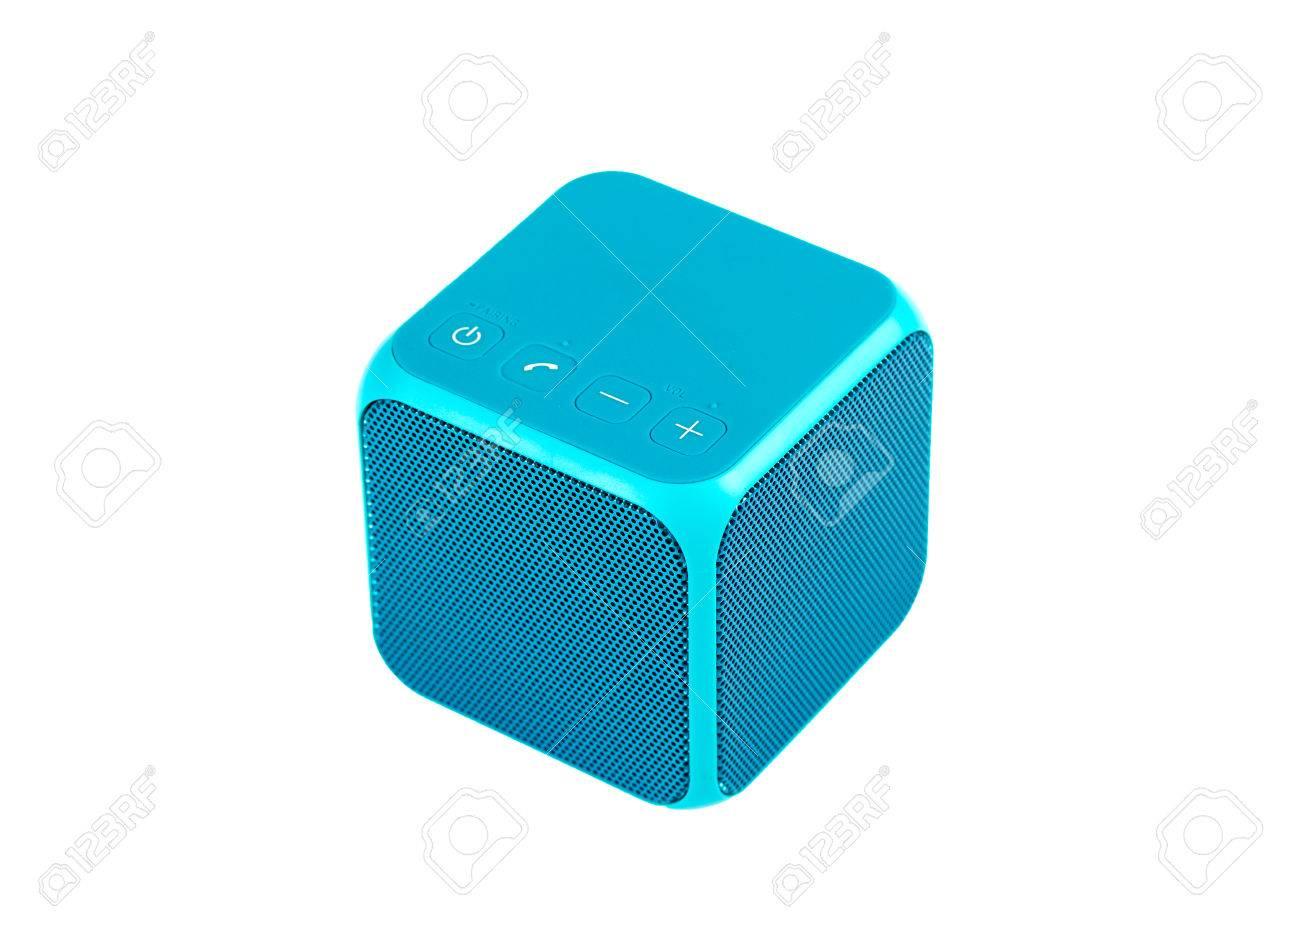 Blue bluetooth speaker cube isolated on white background